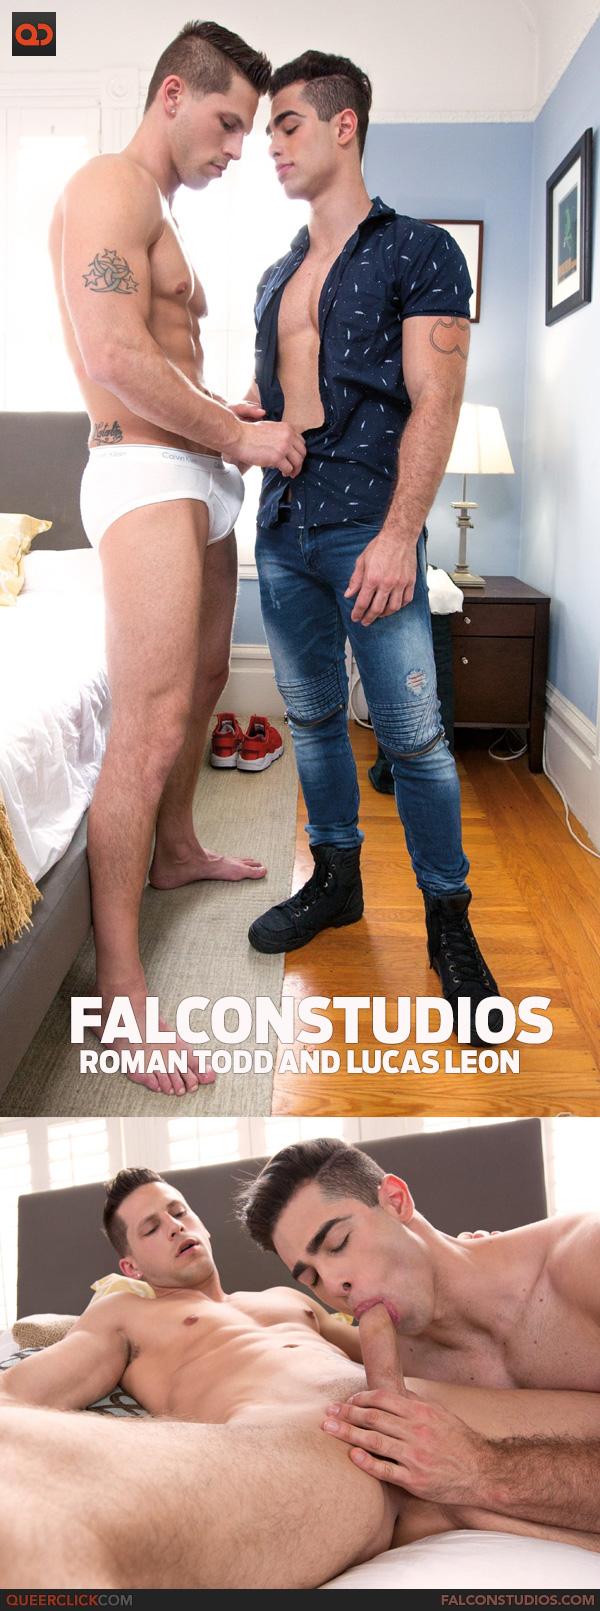 Falcon Studios: Roman Todd and Lucas Leon